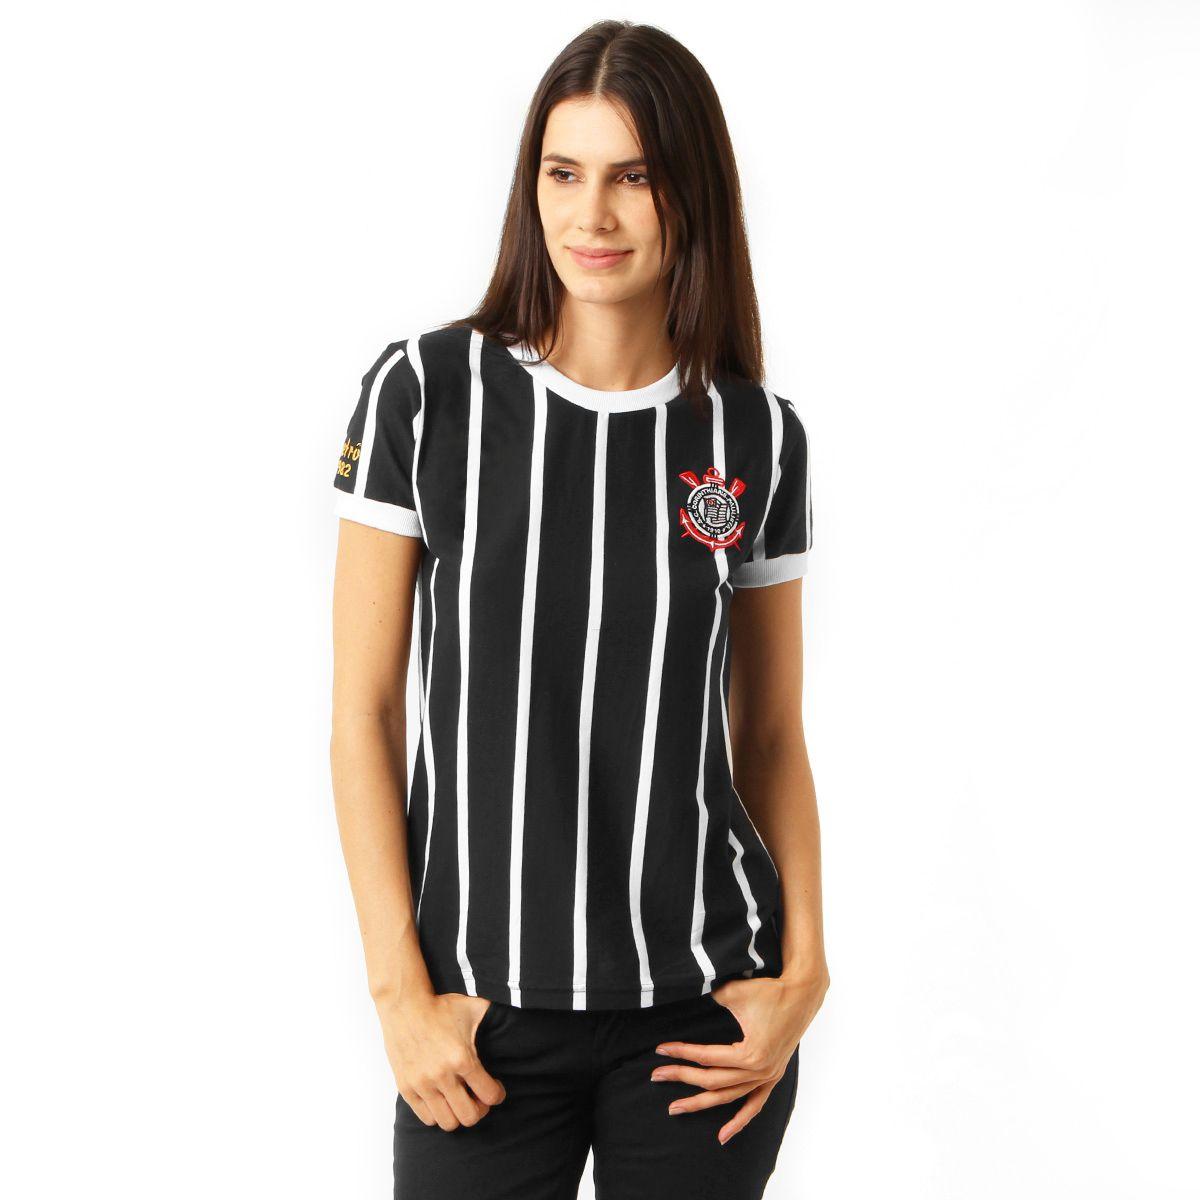 Camisa Retrô Corinthians Democracia 1982 Feminina S/N